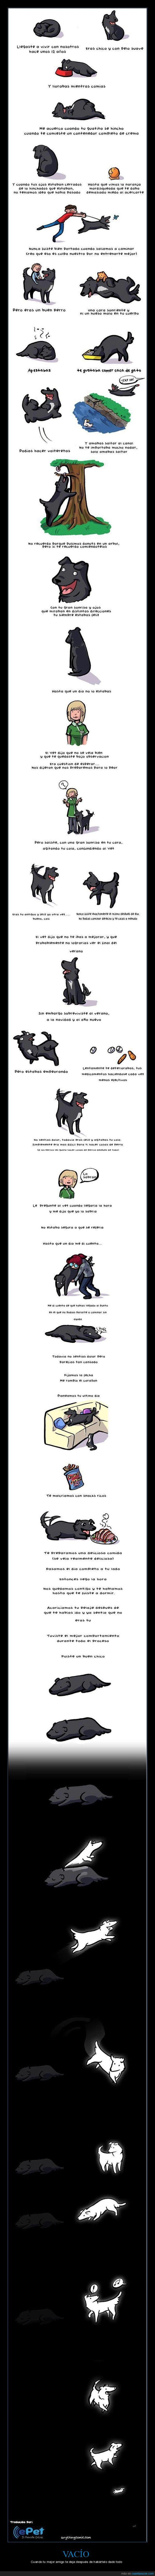 amigo,dep,mascota,muerte,perro